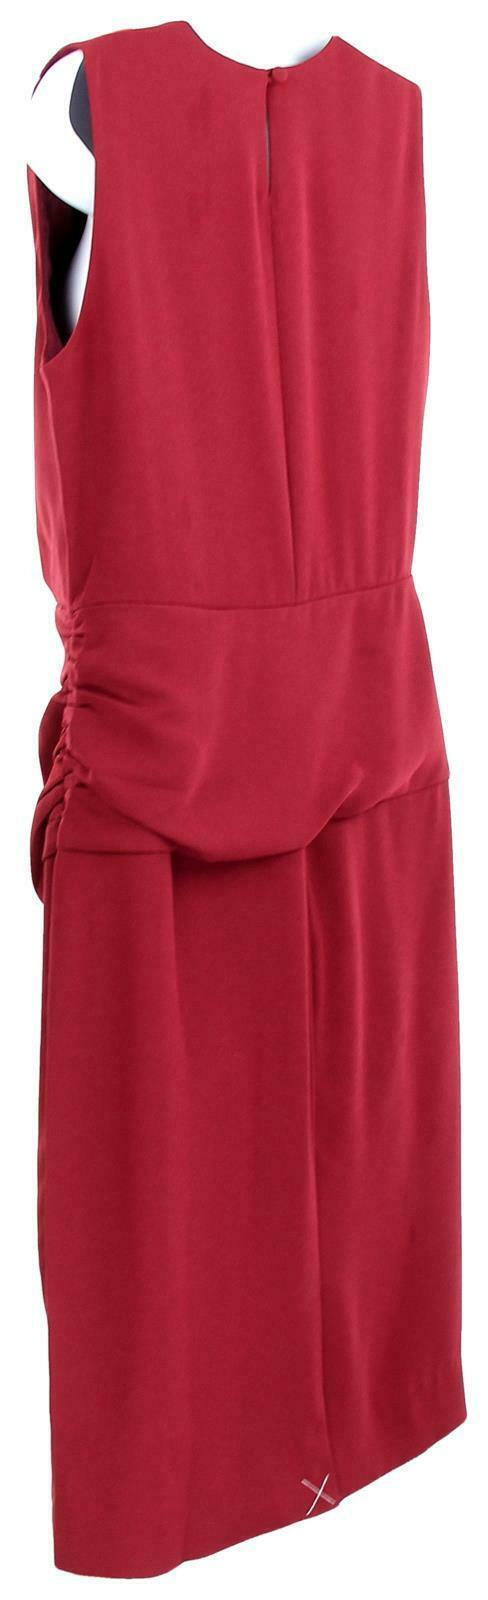 J Crew Women's High Neck Sheath Dress Everyday Lucky Crepe Wear to Work 8 J7452 image 5